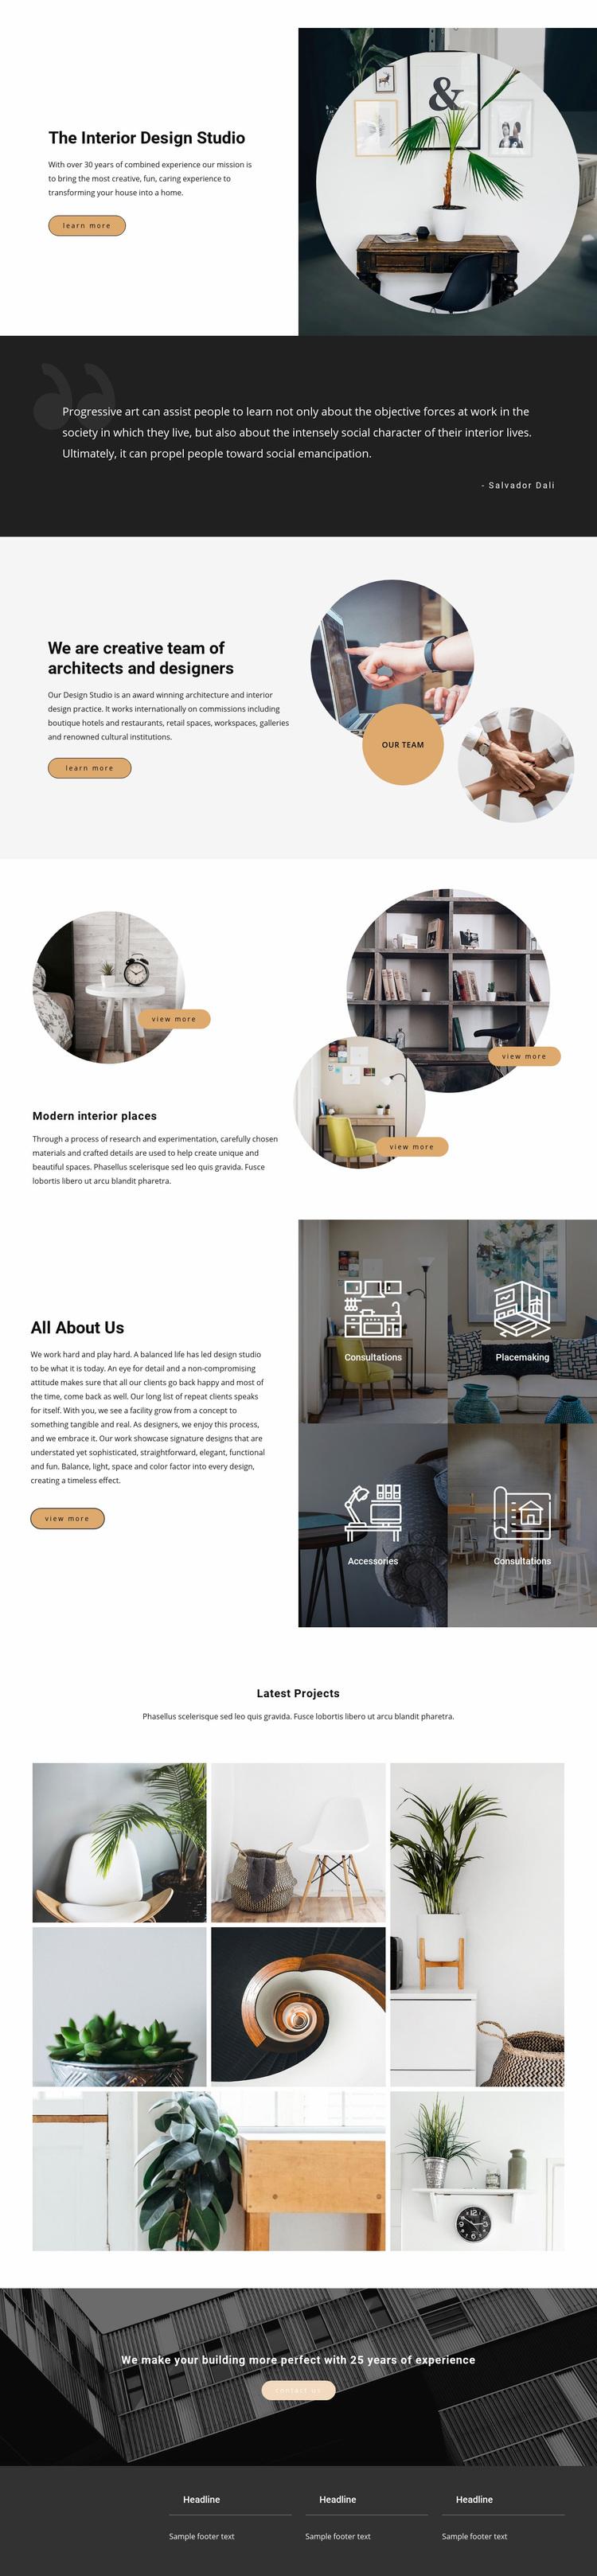 Interior innovations Web Page Designer